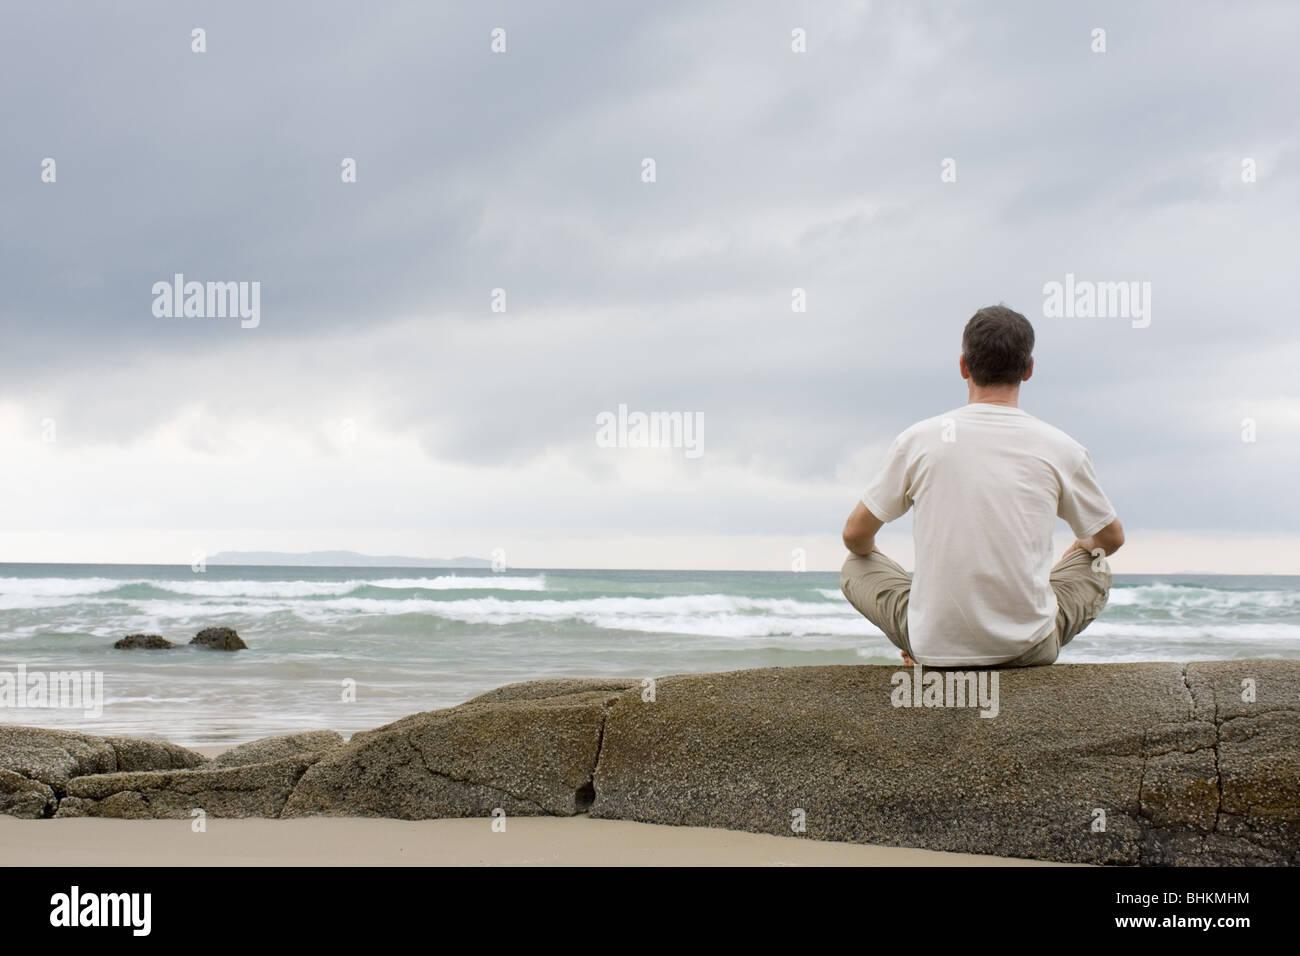 Man meditating on a rock at the sea - Stock Image